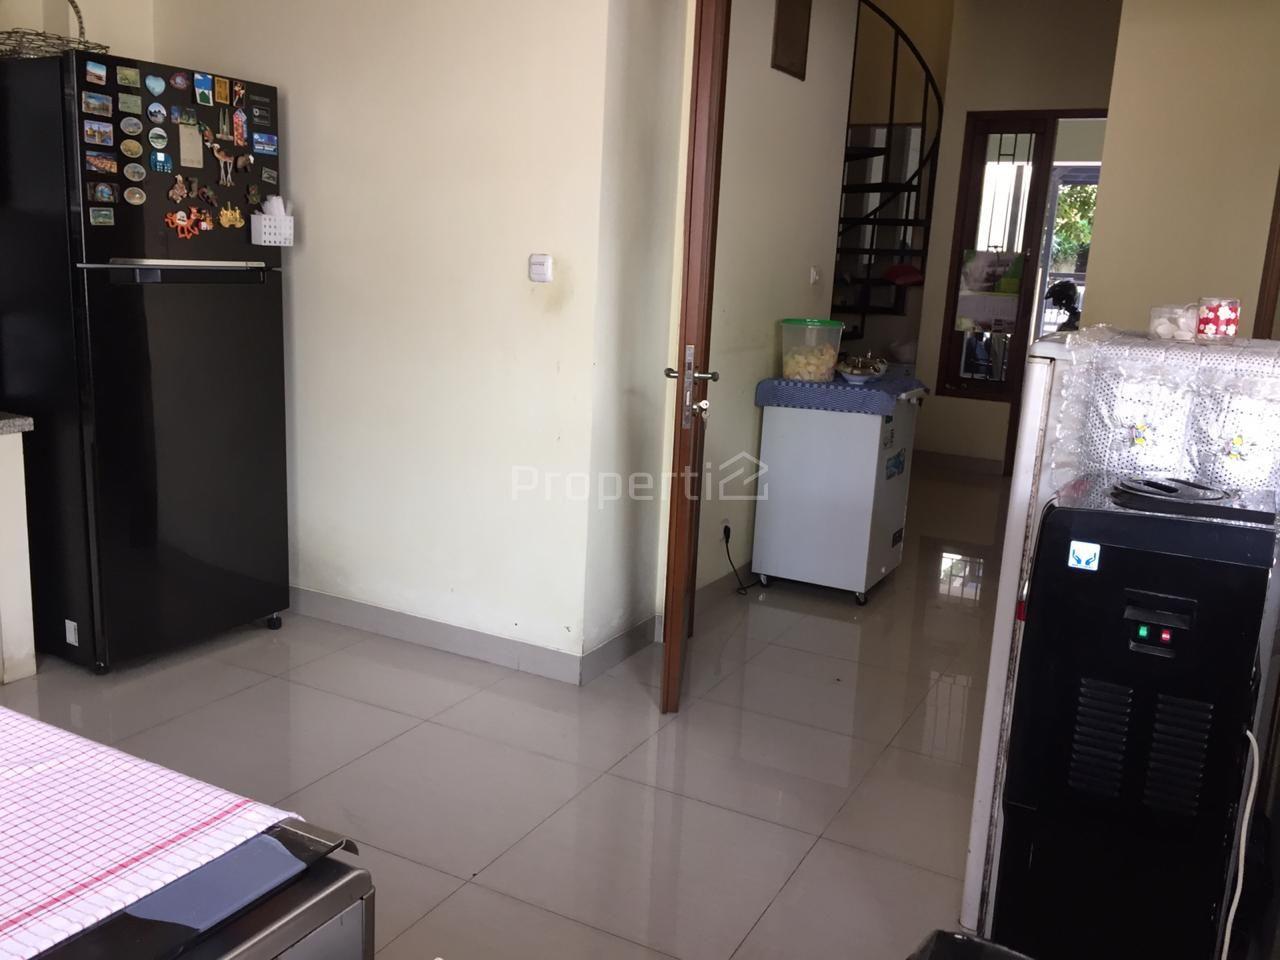 Rumah Perumahan di Perumahan Bukit Cirendeu, Ciputat